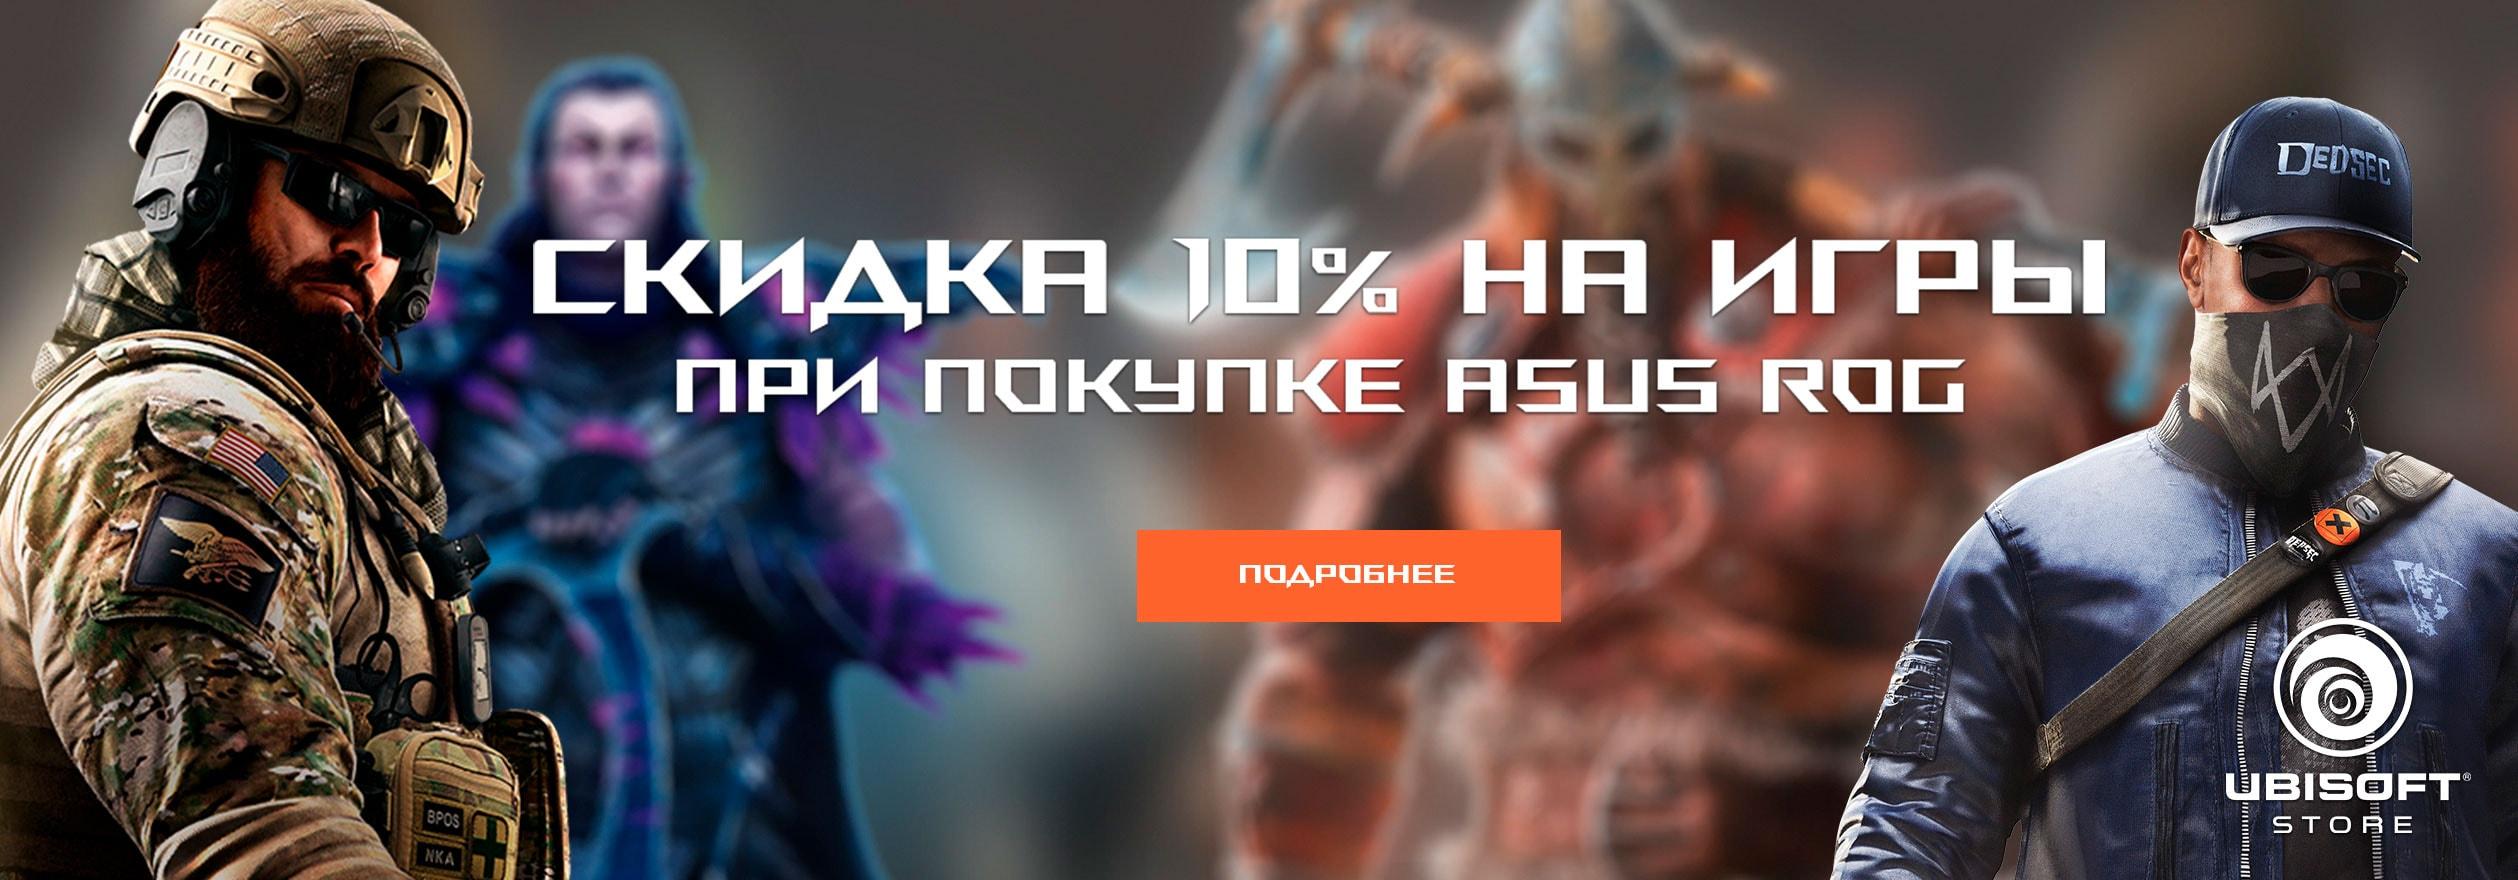 Ubisoft Asus